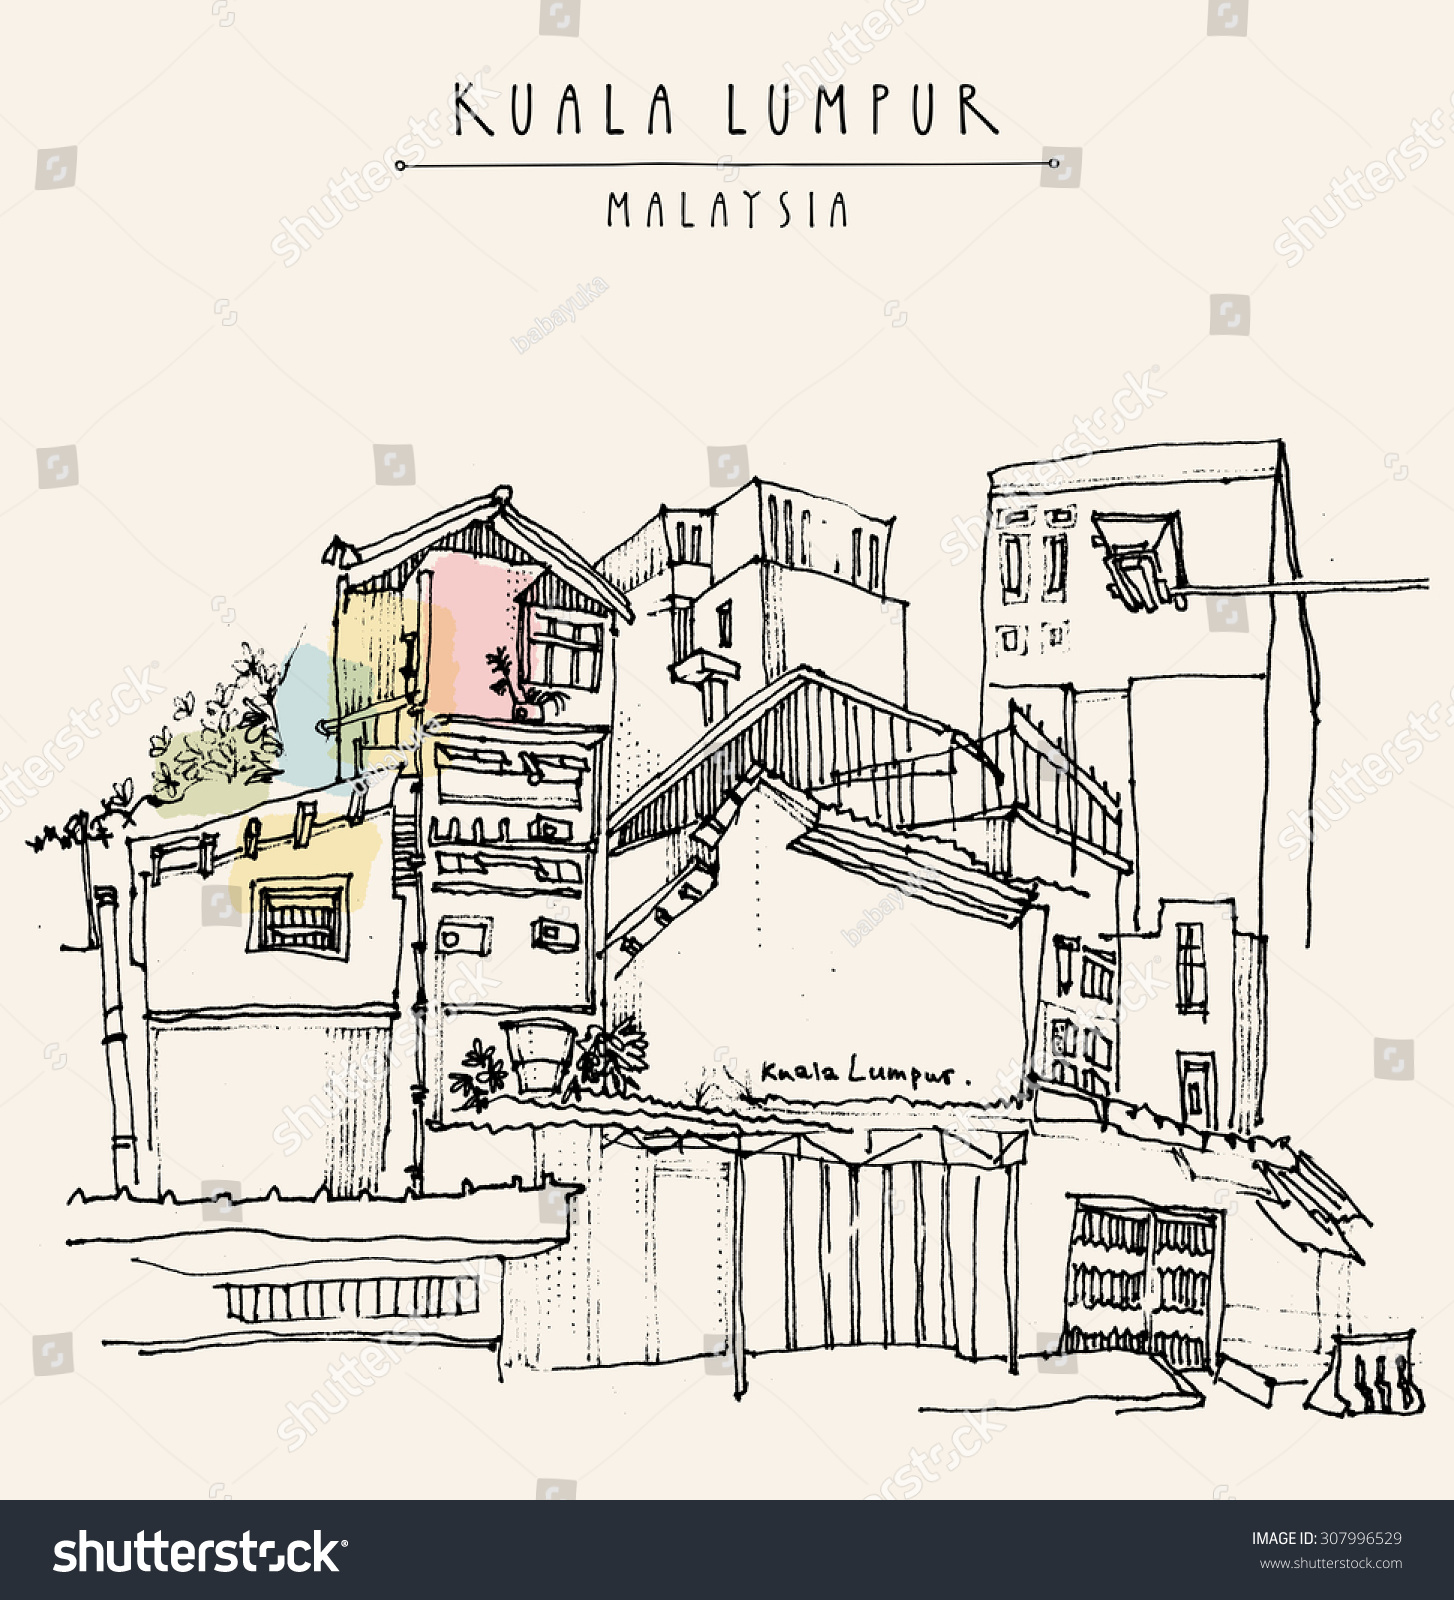 Kuala Lumpur Malaysia Casual View Of Buildings In China Town